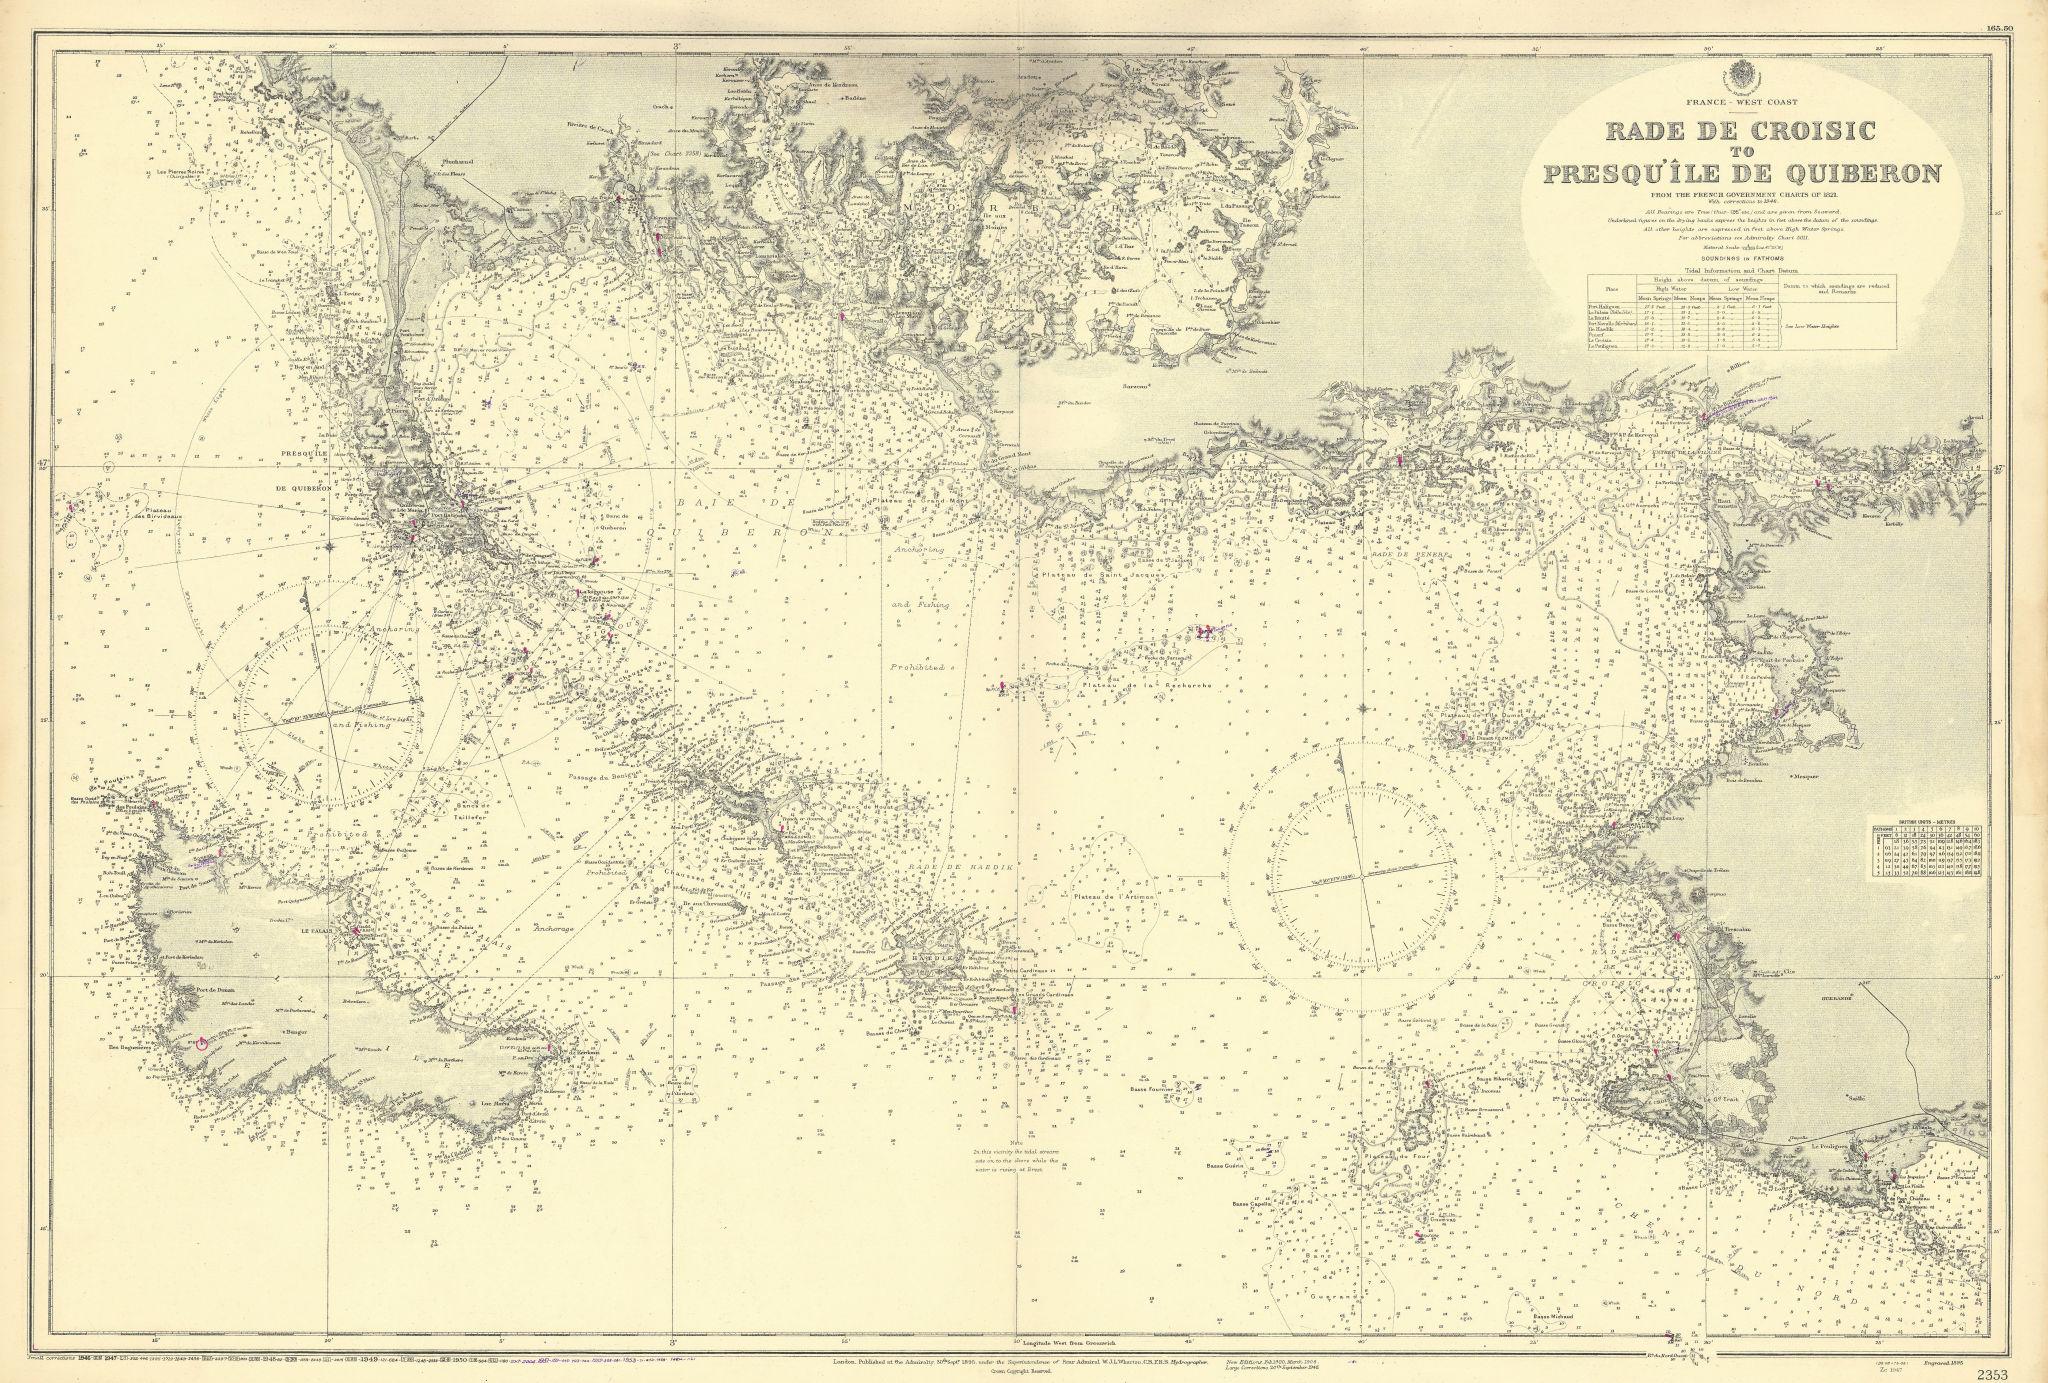 Loire-Atlantique Morbihan Quiberon Belle-Île ADMIRALTY chart 1895 (1954) map